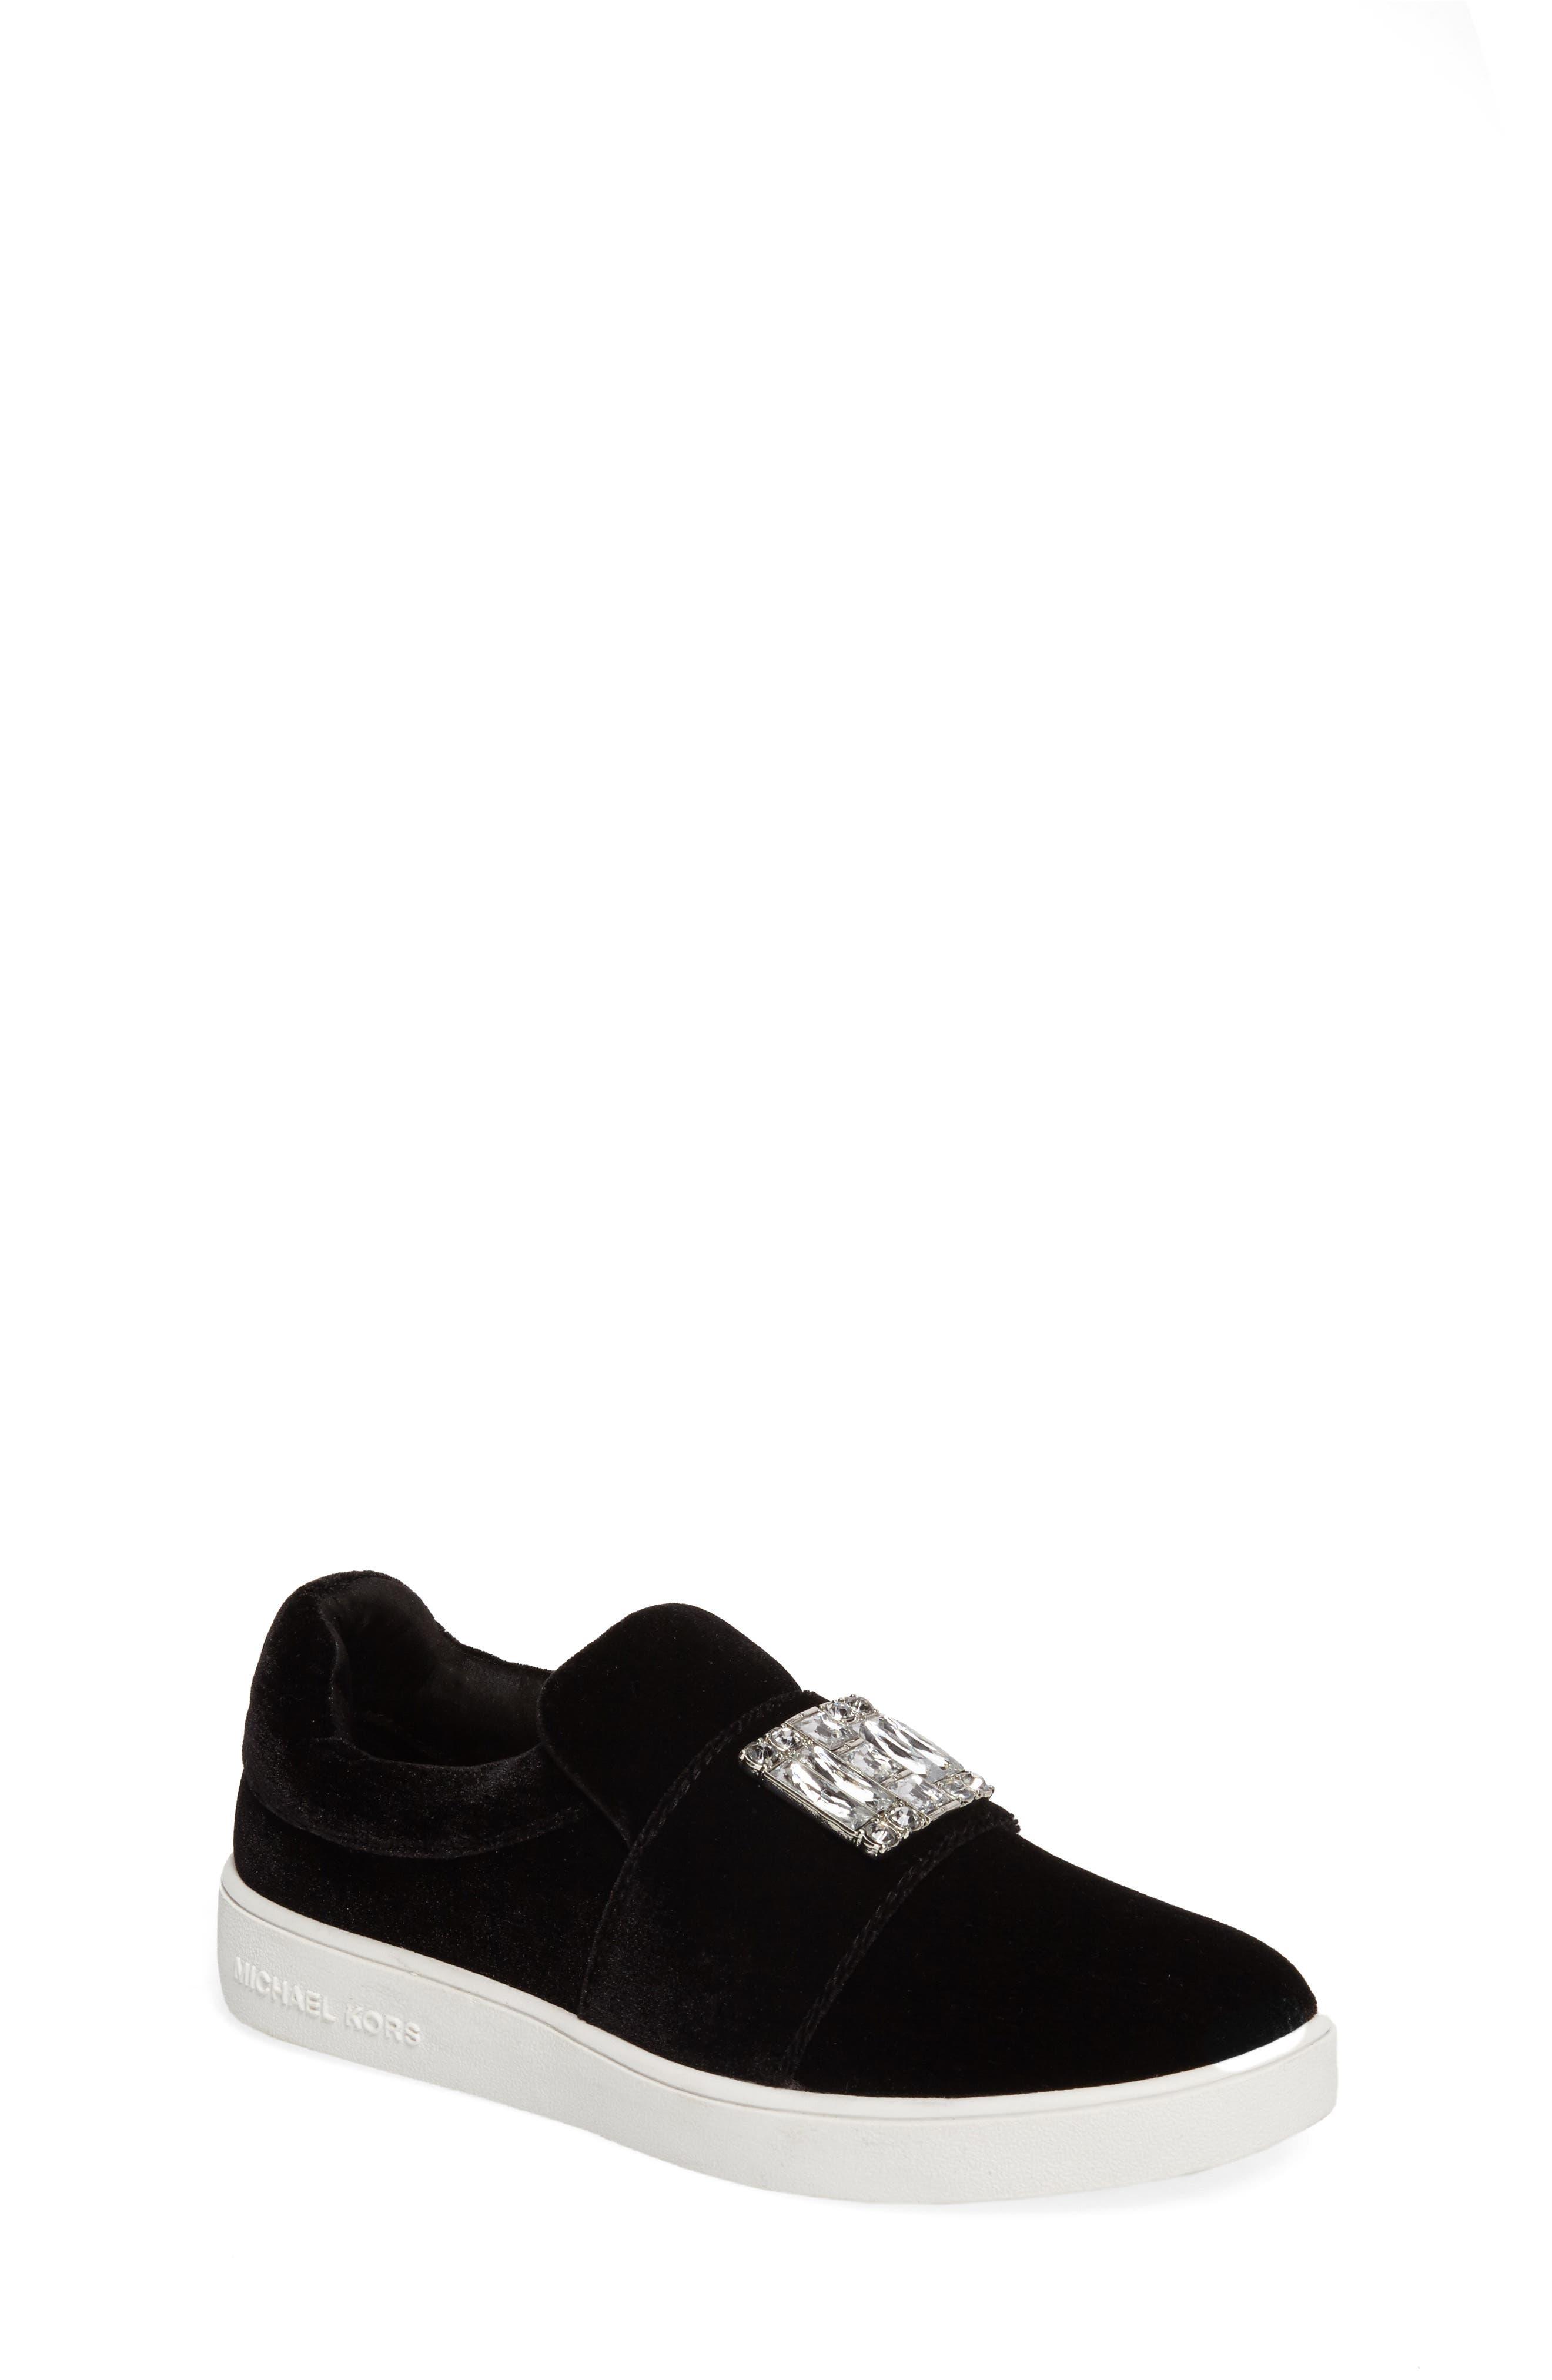 Ivy Dream Embellished Slip-On Sneaker,                             Main thumbnail 1, color,                             001